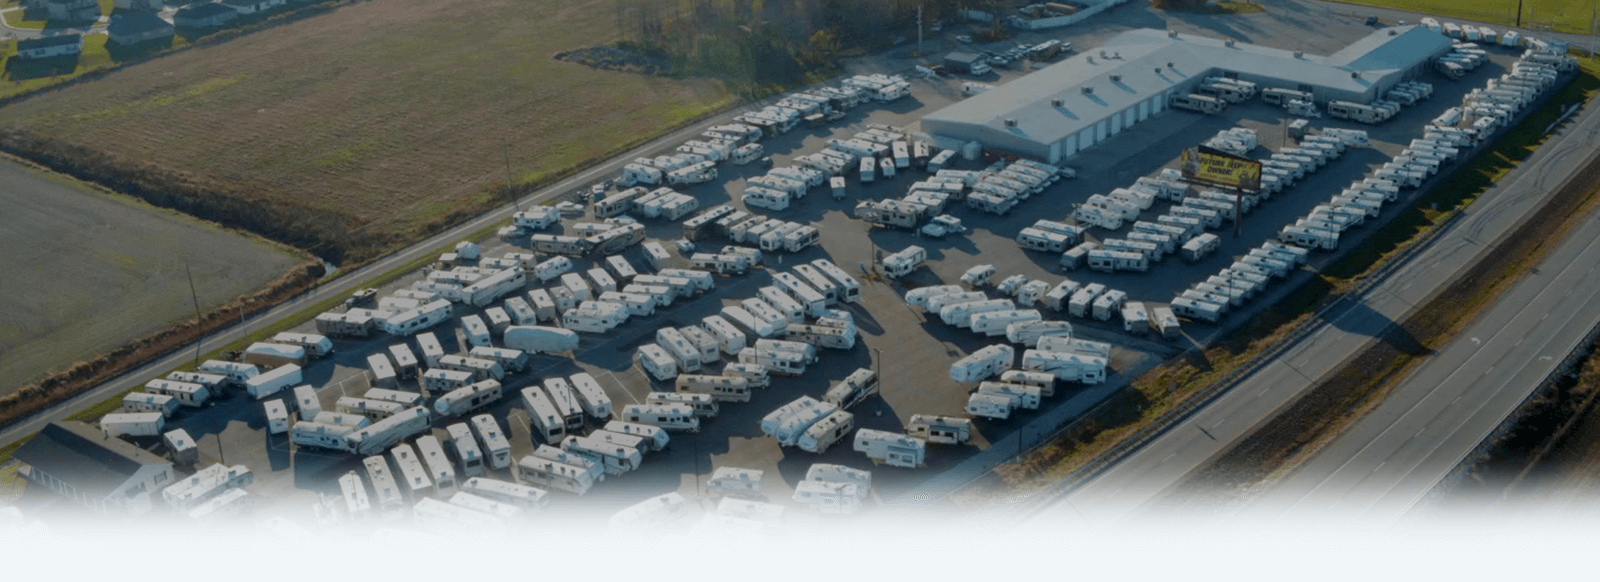 Evansville RV Sales | Indiana, Kentucky, Illinois Camper Sales